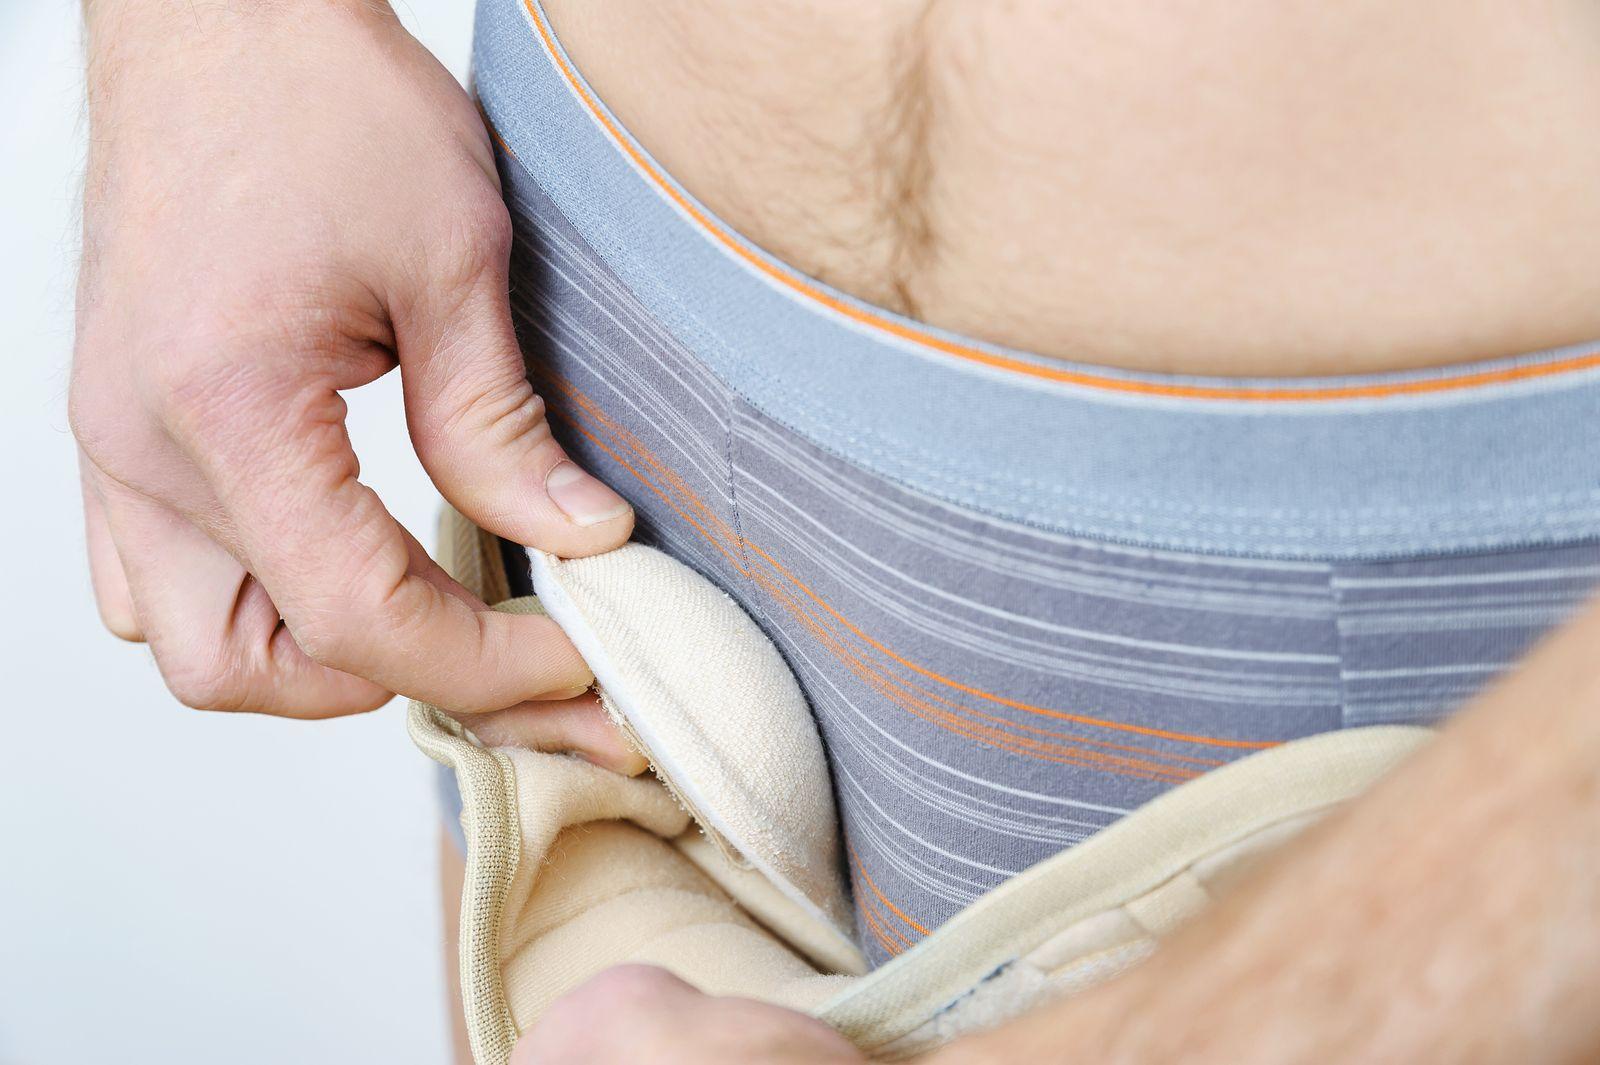 Consejos Para Prevenir Una Hernia Inguinal